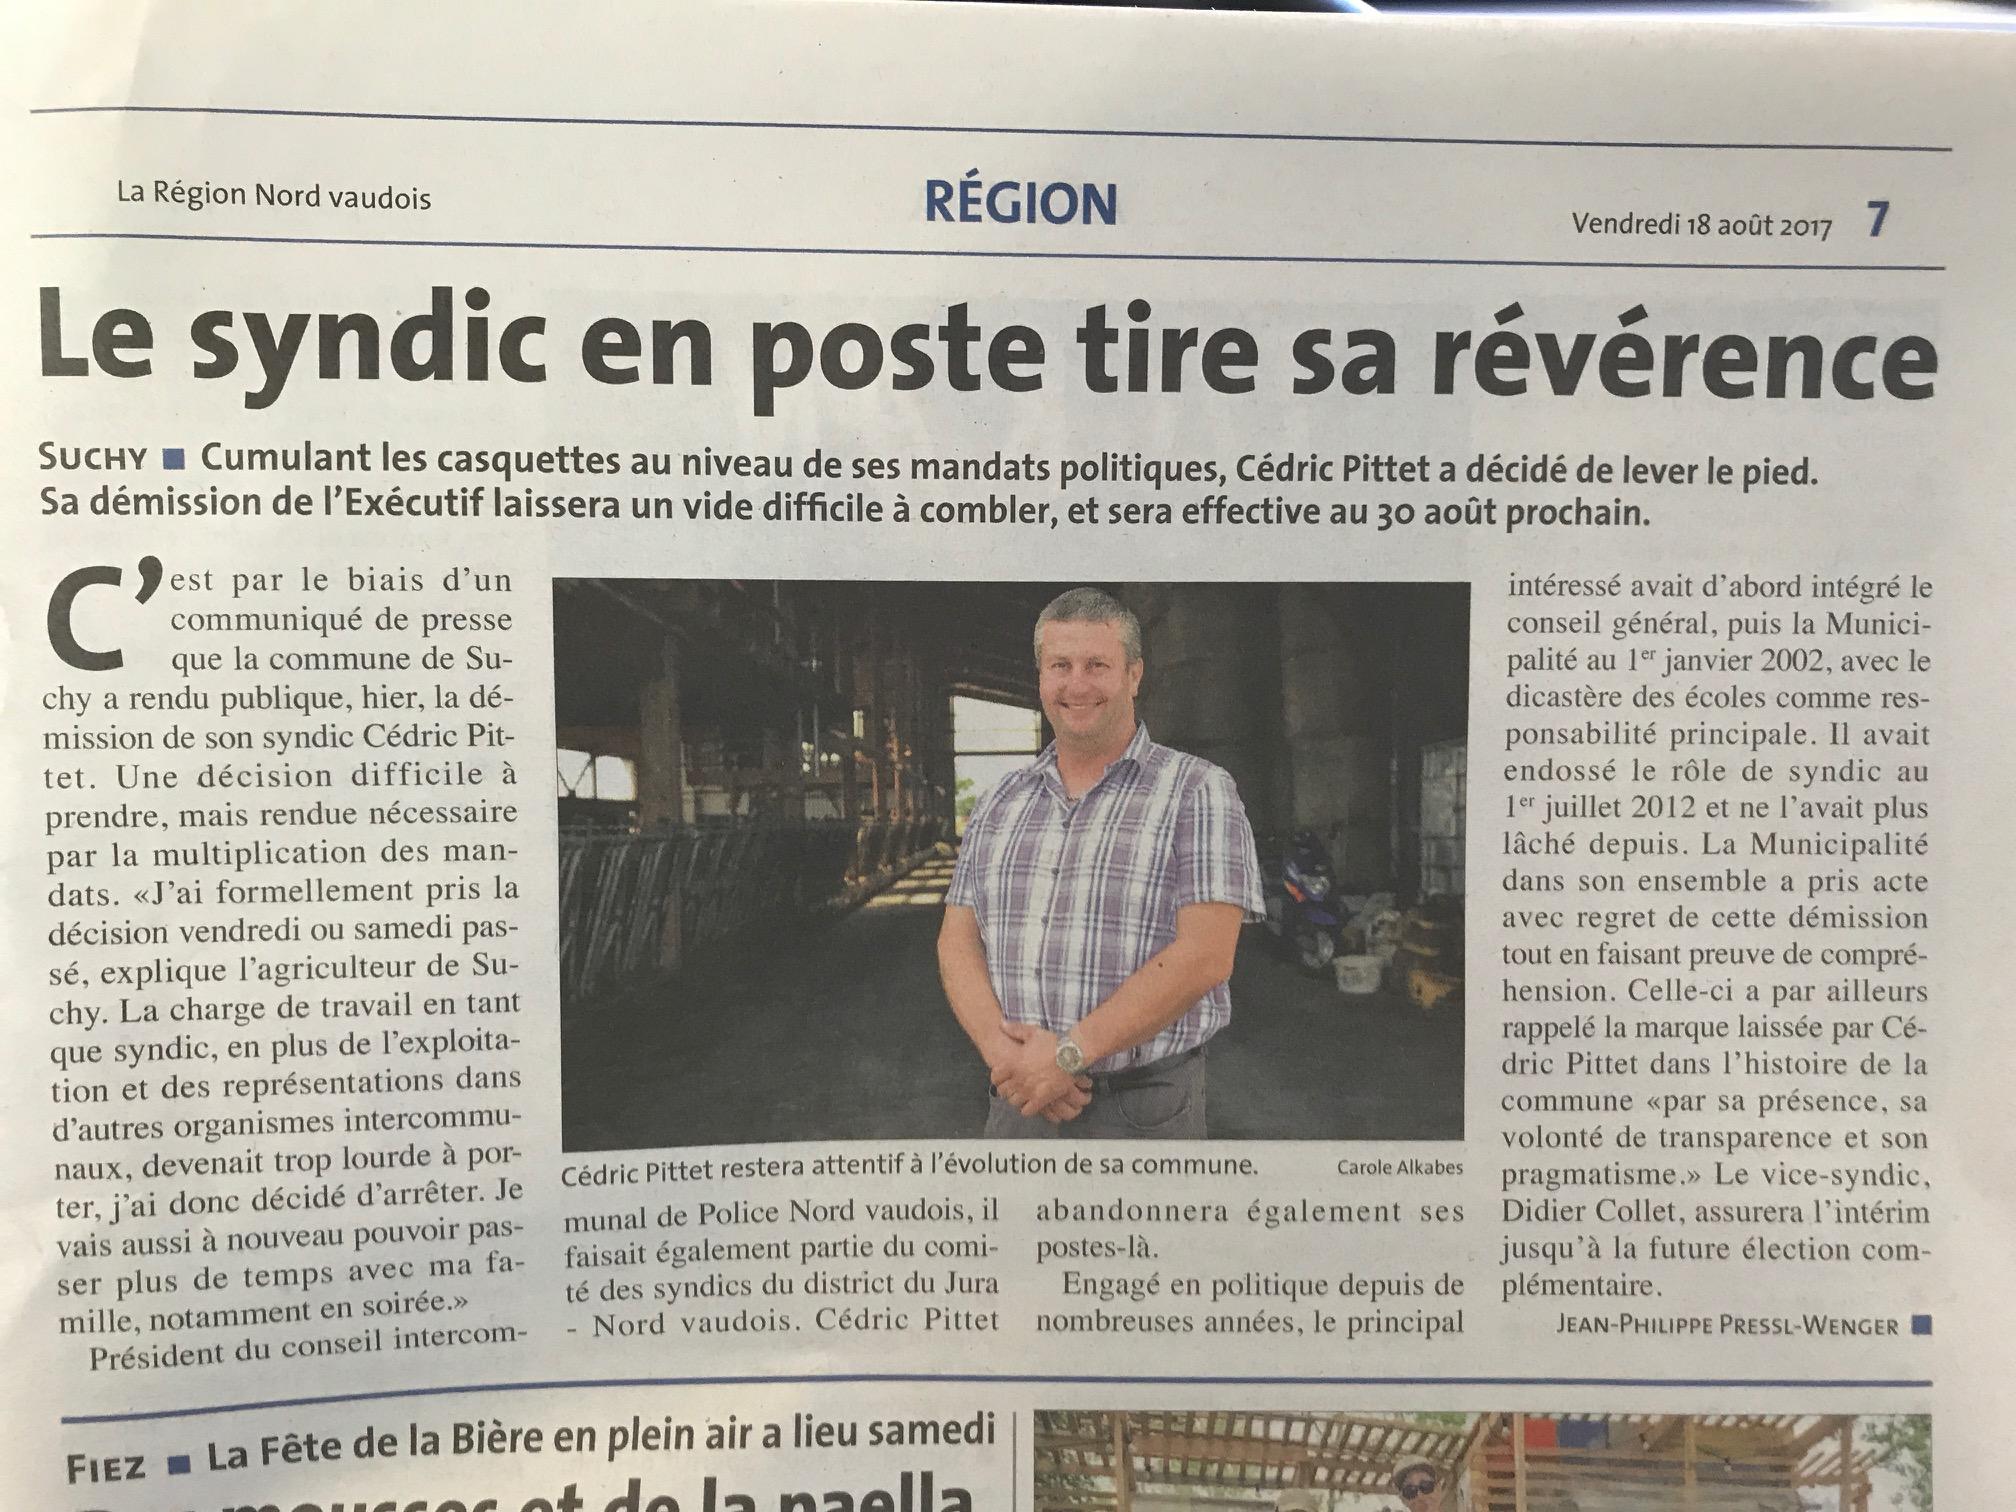 La Région, 18 août 2017